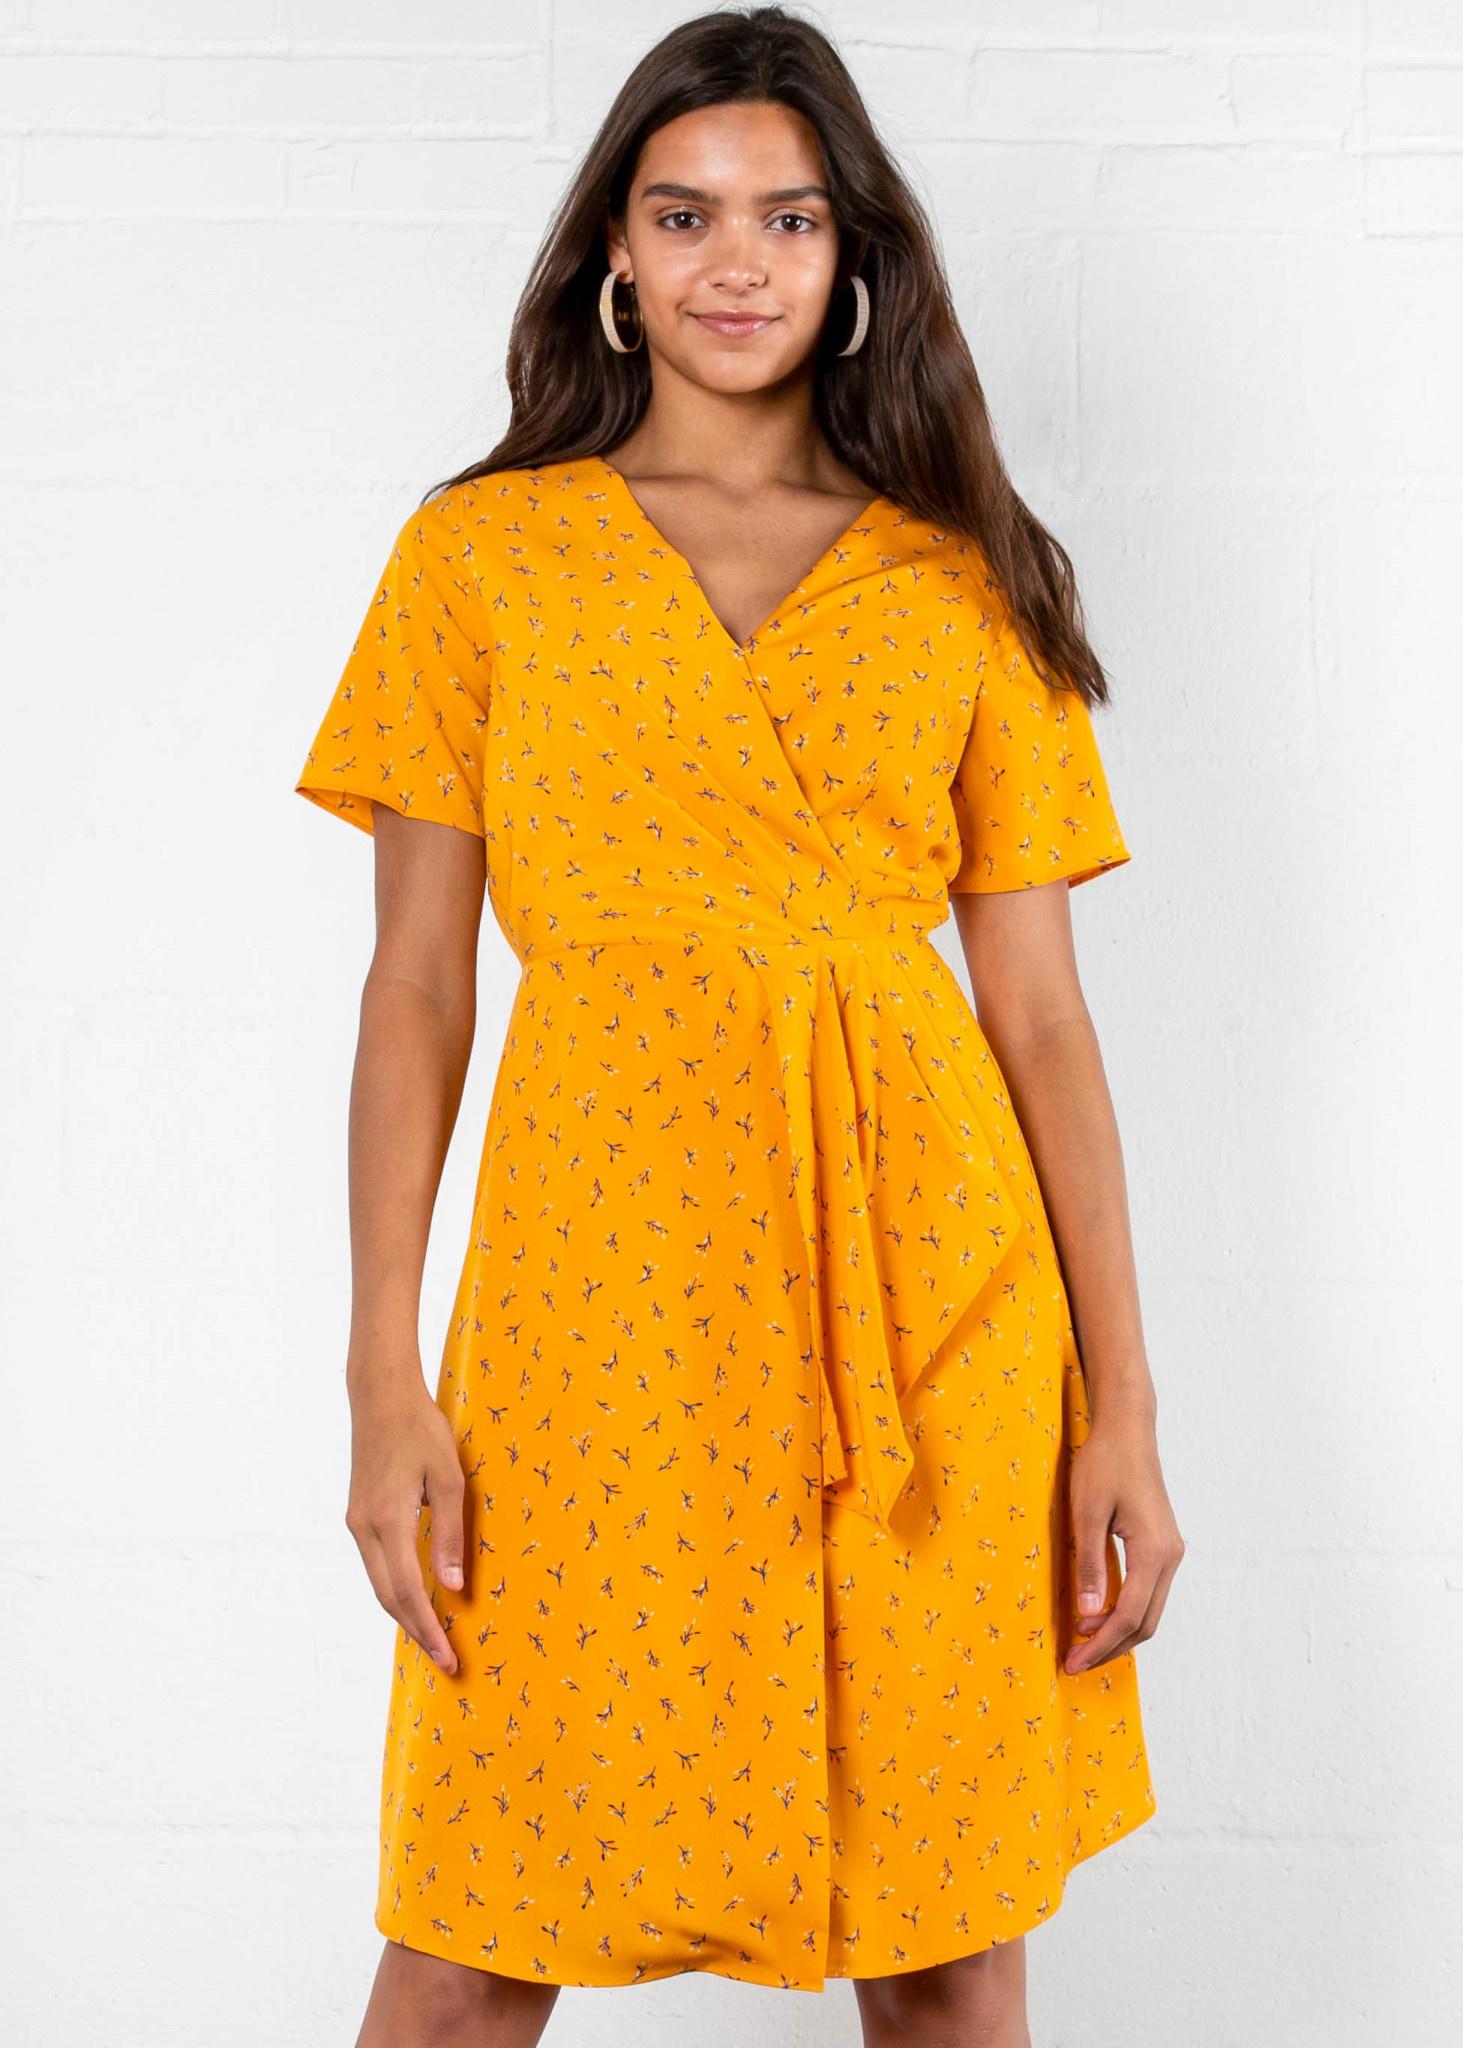 HONEYSUCKLE PRINTED DRESS